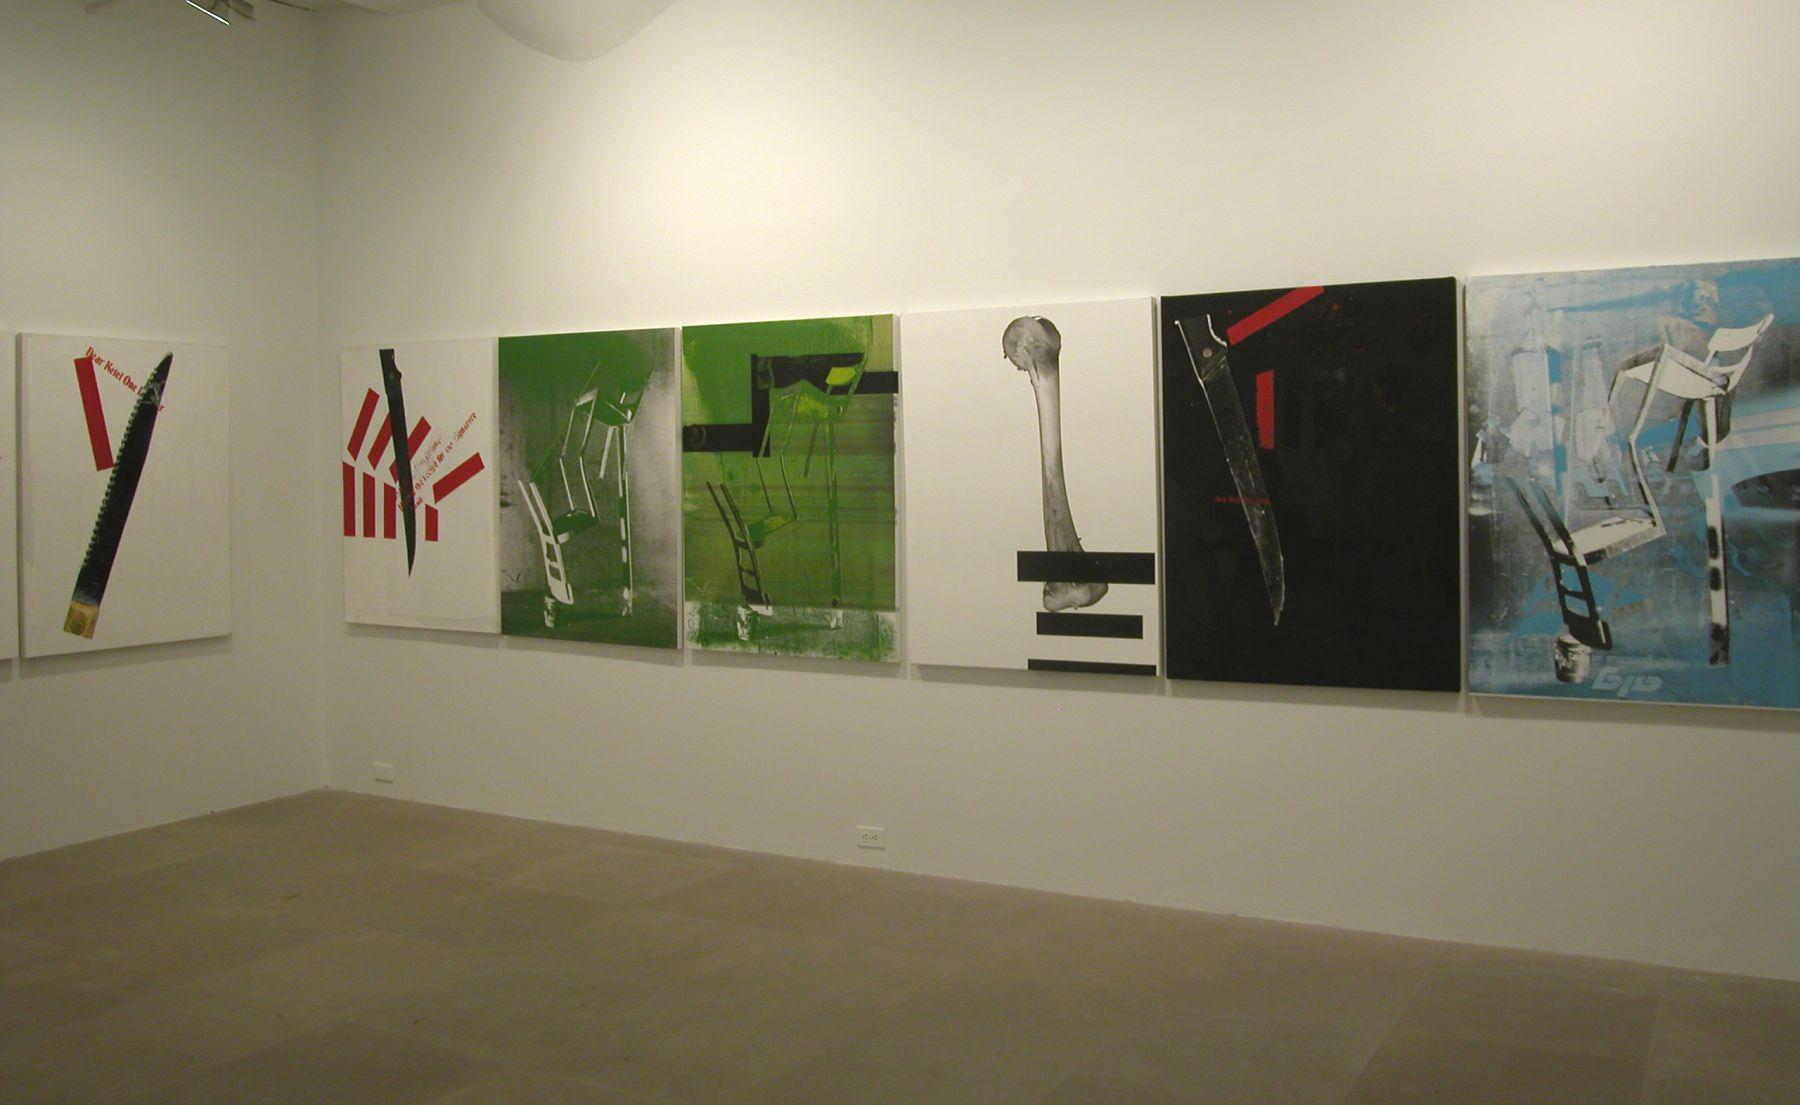 Installation view, The Failever of Judgement Part III,  Greene Naftali, New York, 2005